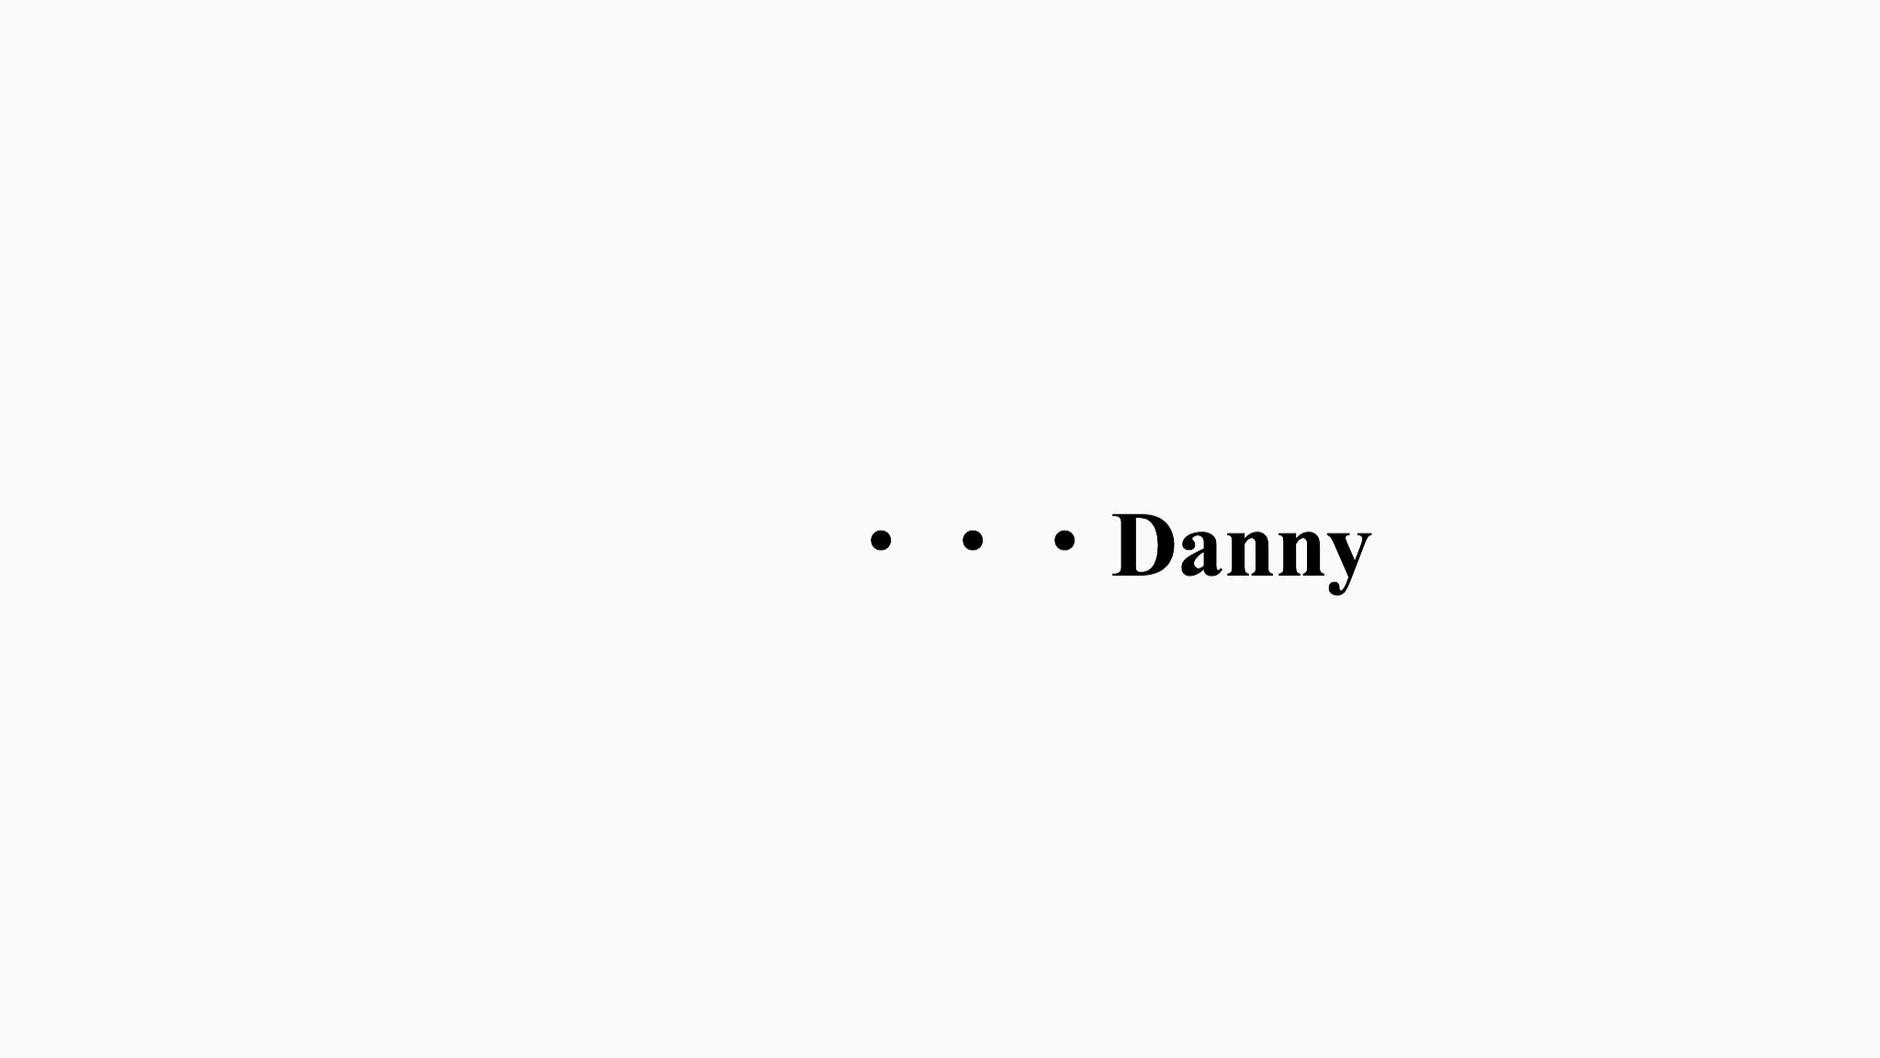 ・ ・・Danny  STORE